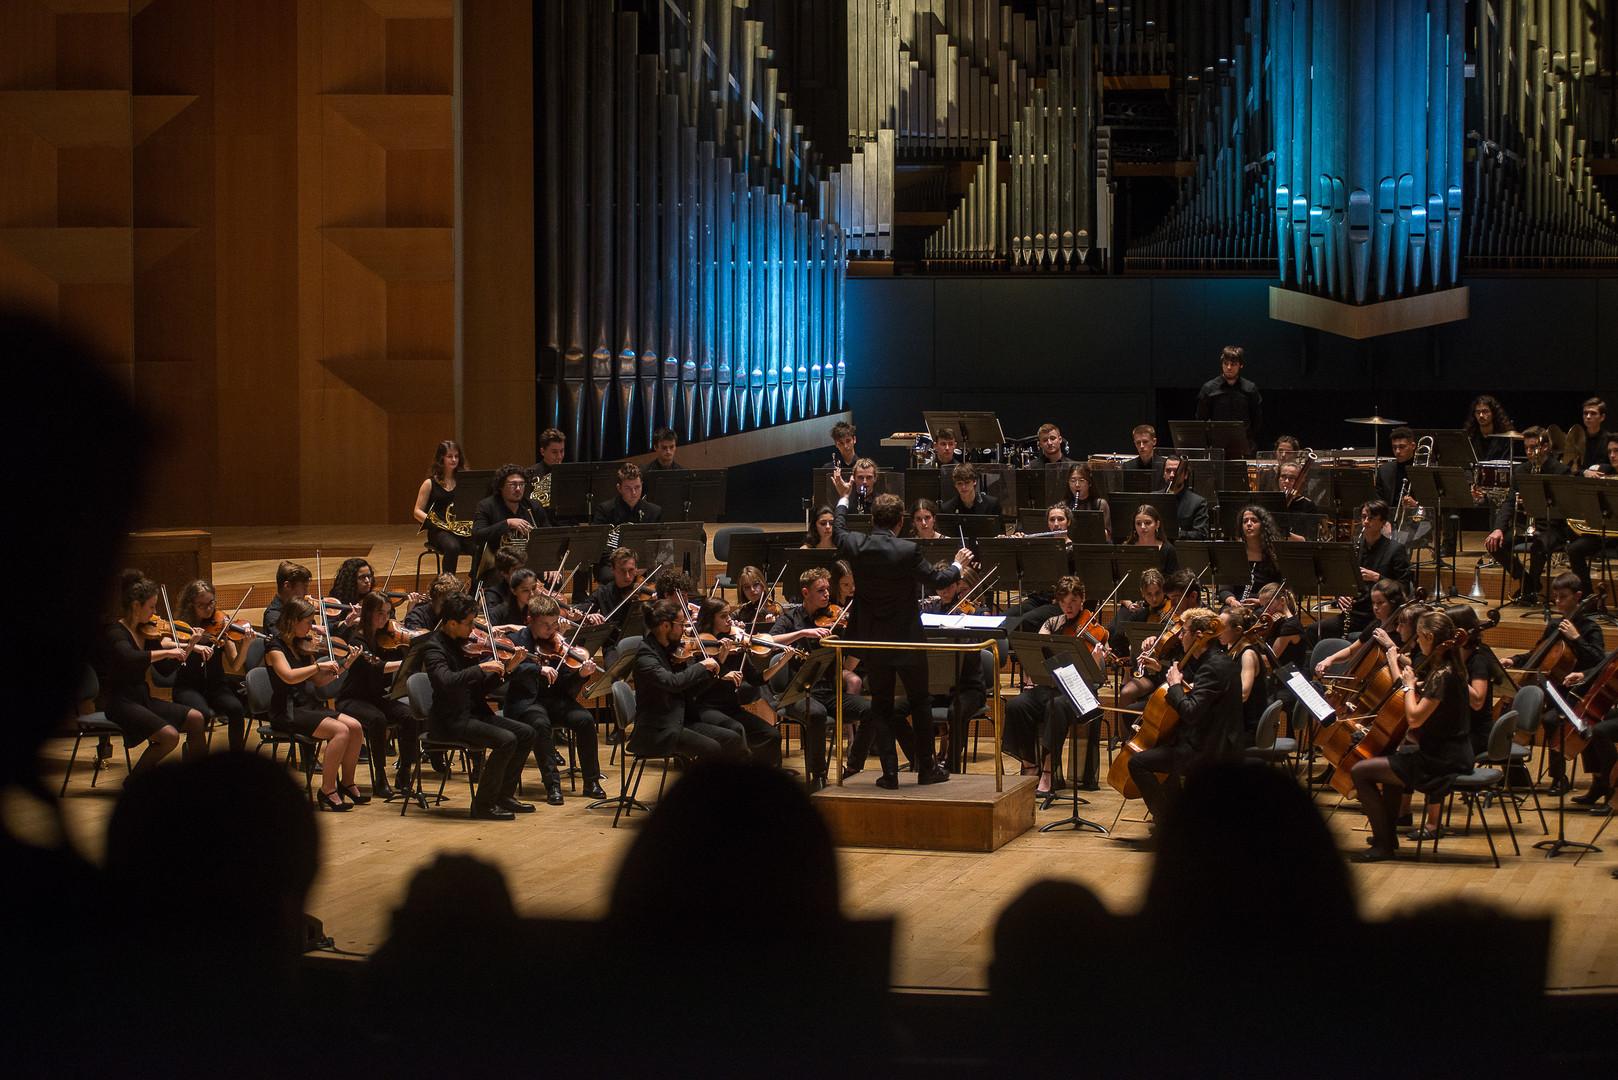 Bertrand Gaudillère - Auditorium de Lyon 2019